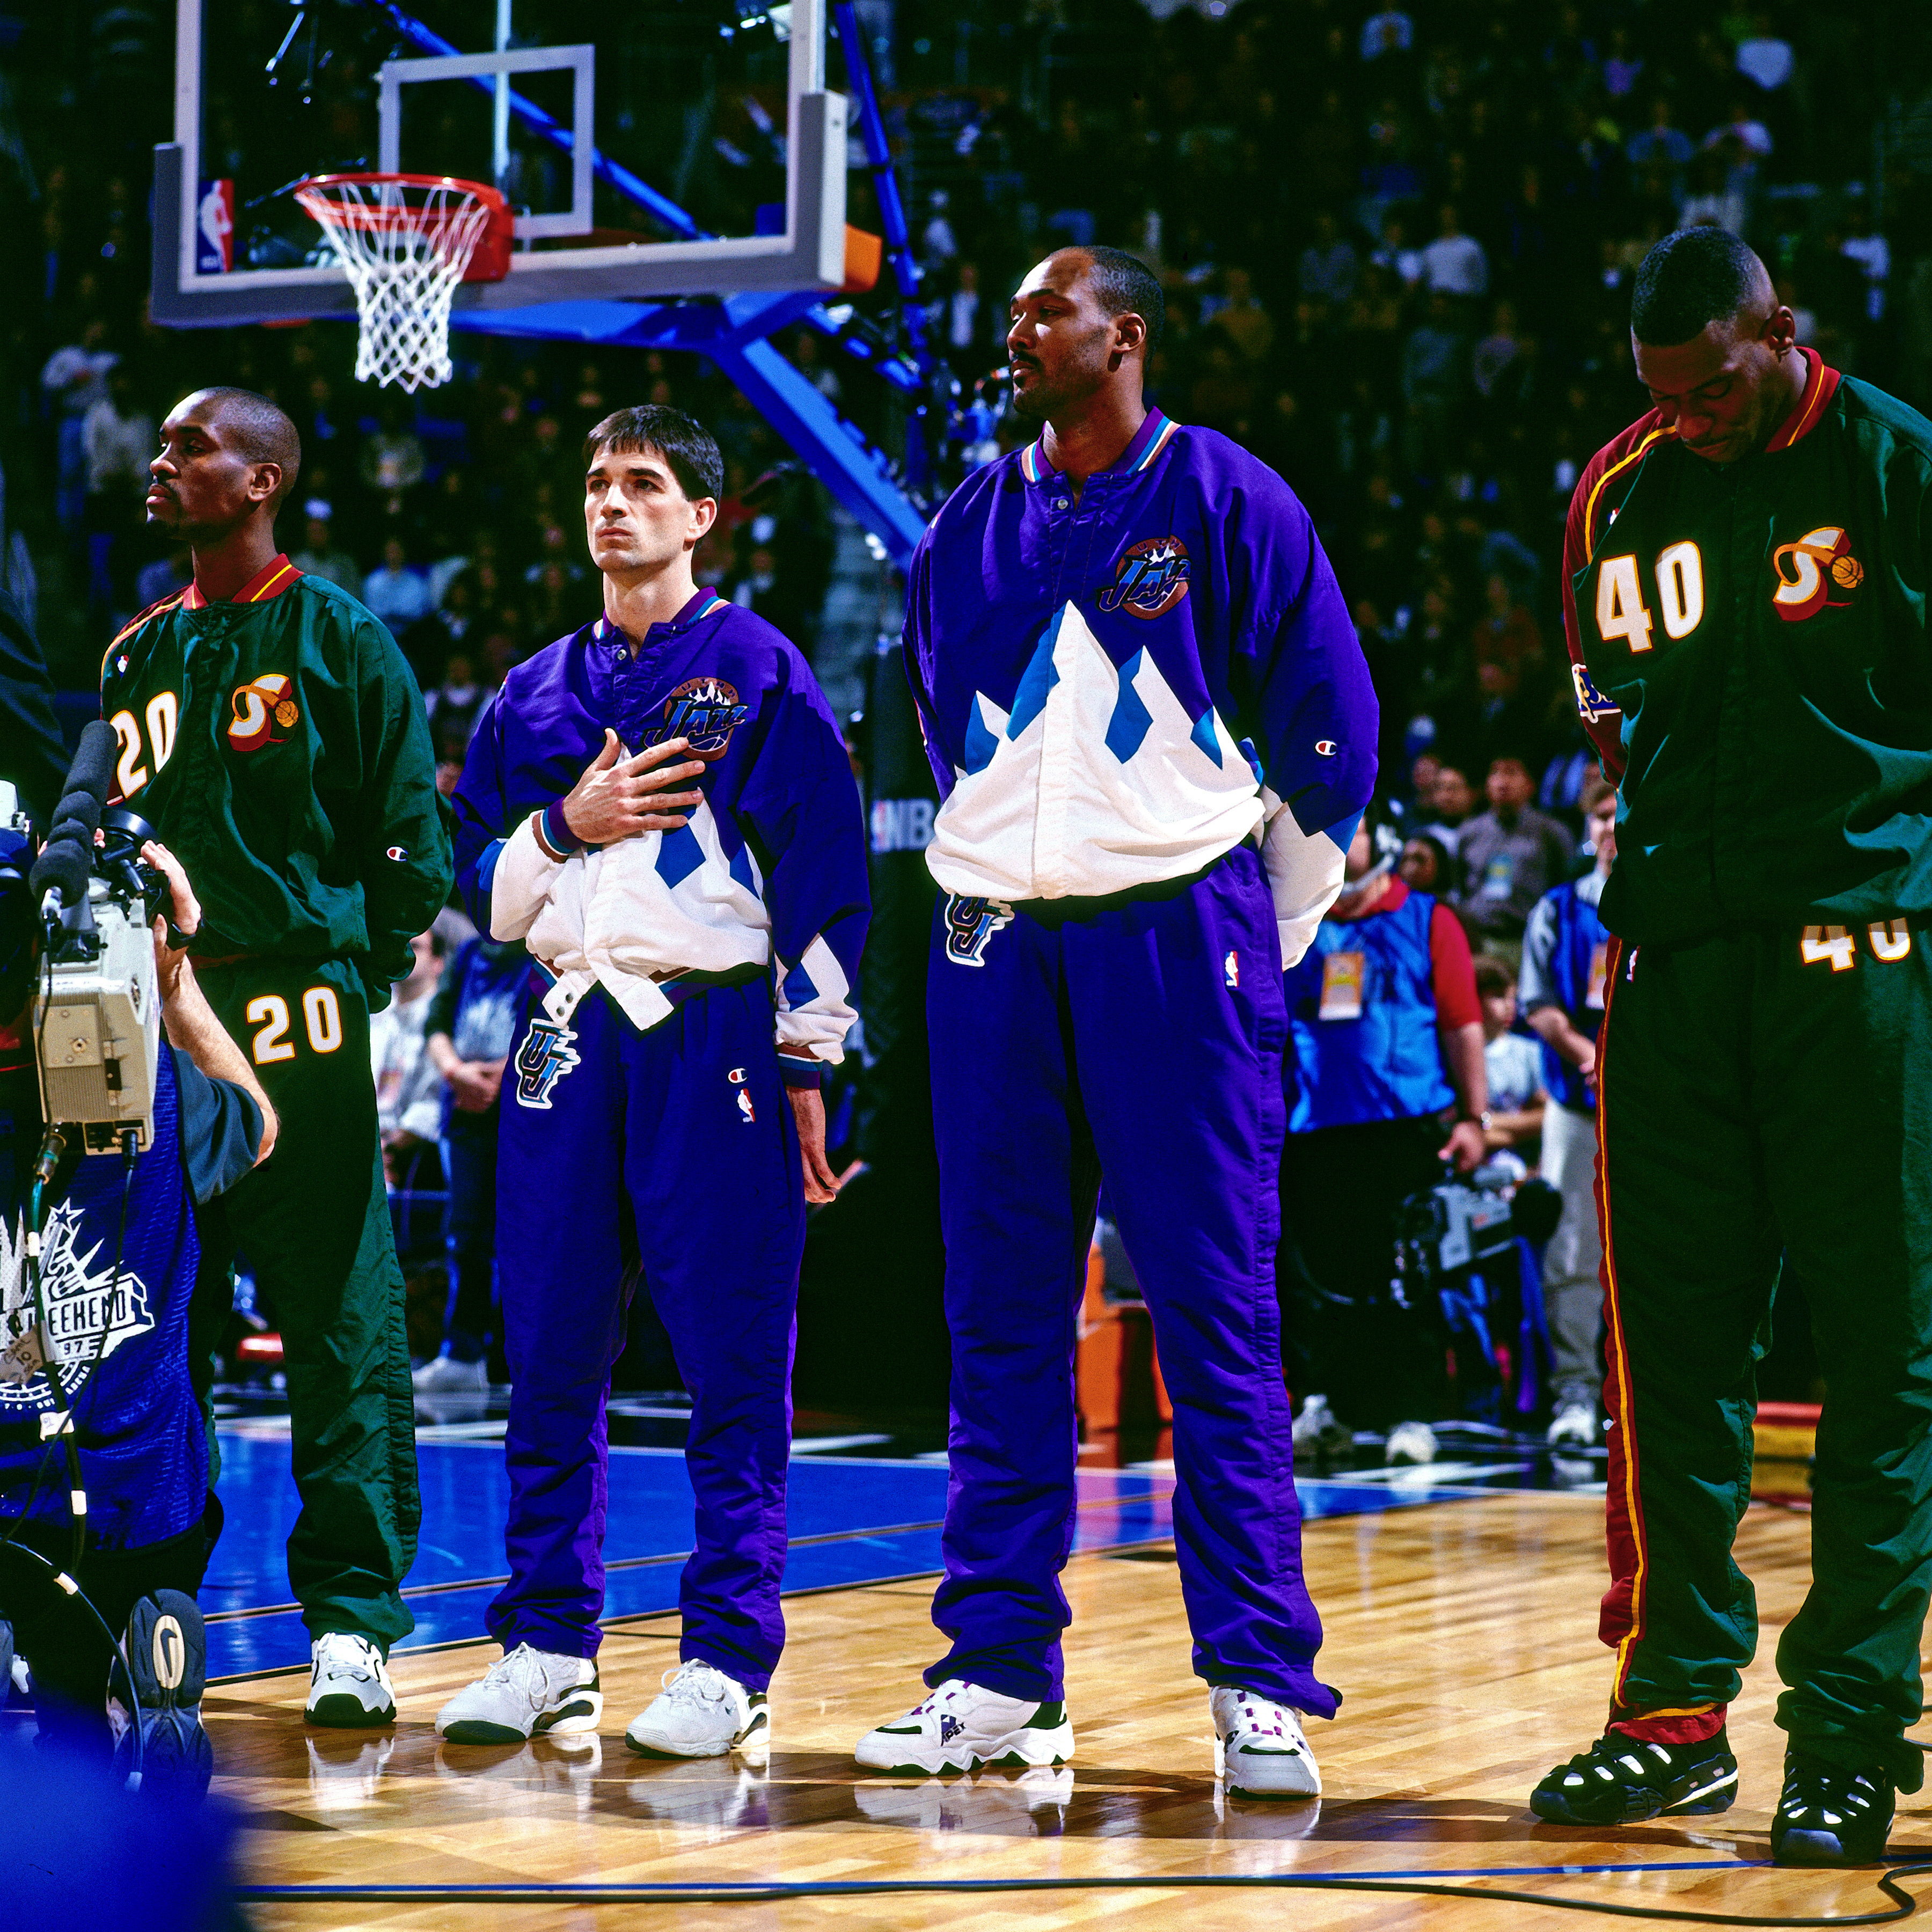 1997 NBA All-Star Game